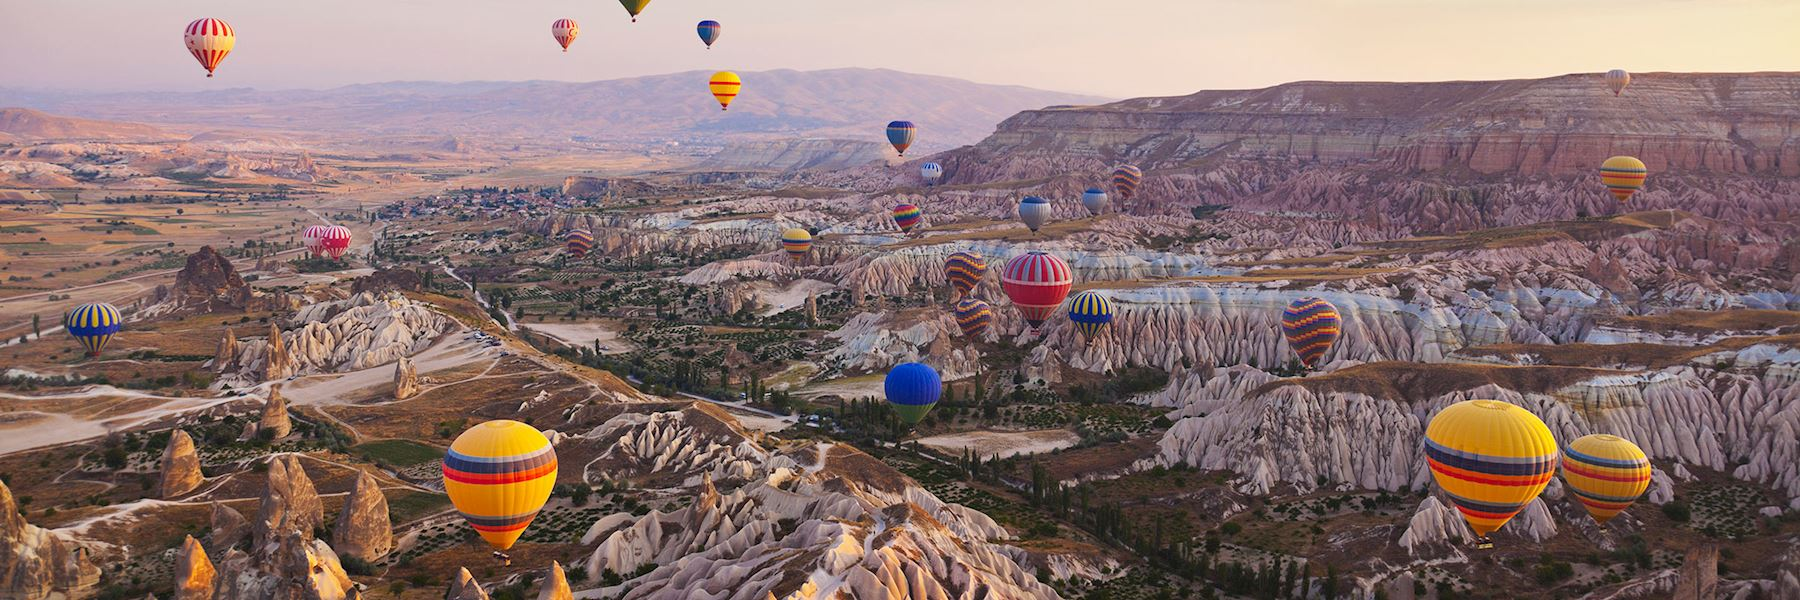 Visit Cappadocia, Turkey